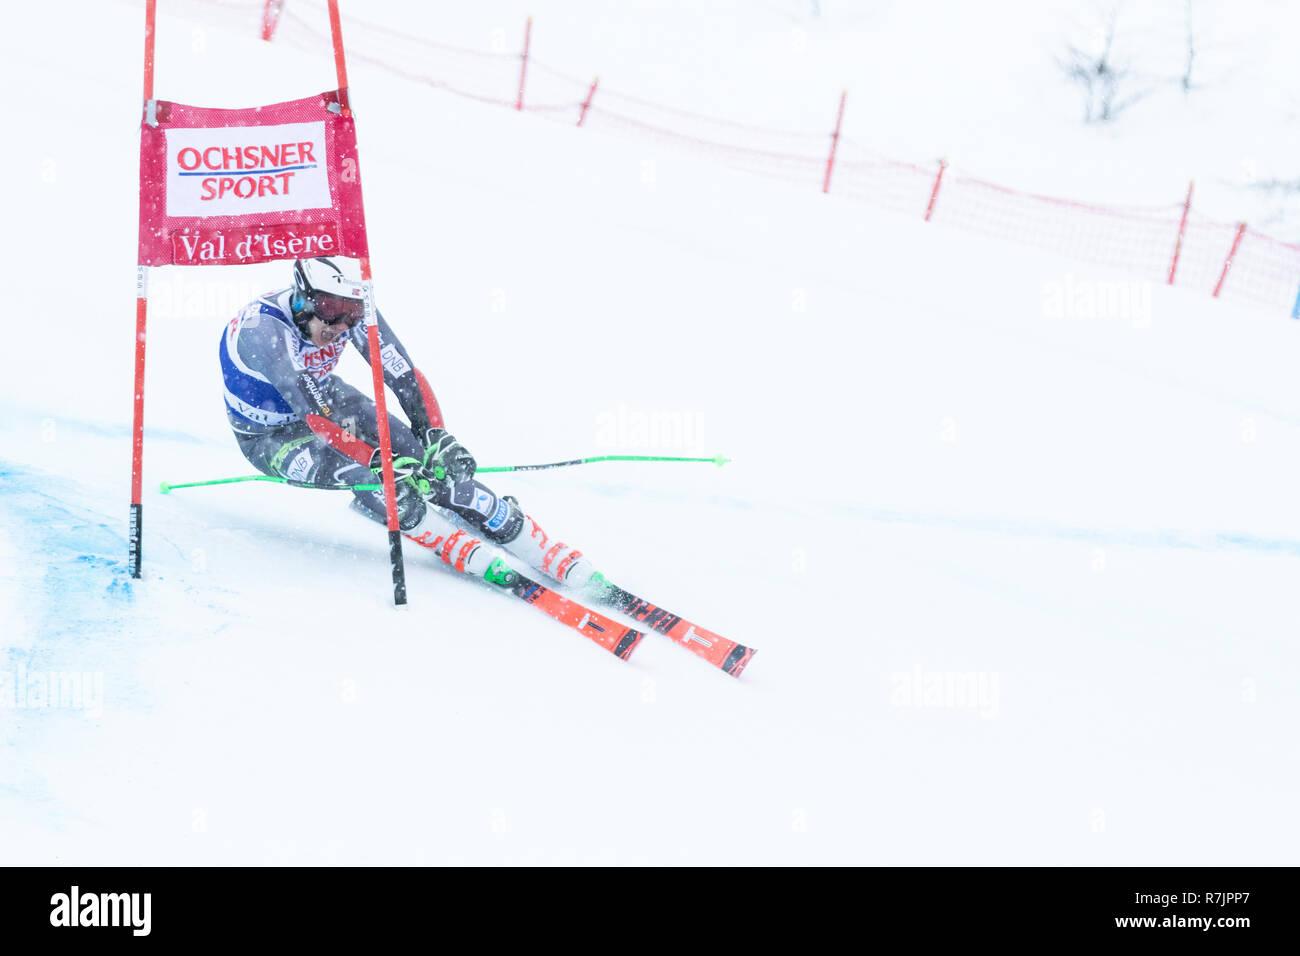 08 Dec. 2018 Henrik Kristoffersen of Norway skiing 1st run Giant Slalom Val d'Isere men's Giant Slalom Audi FIS Alpine Ski world Cup 2019 2nd place - Stock Image